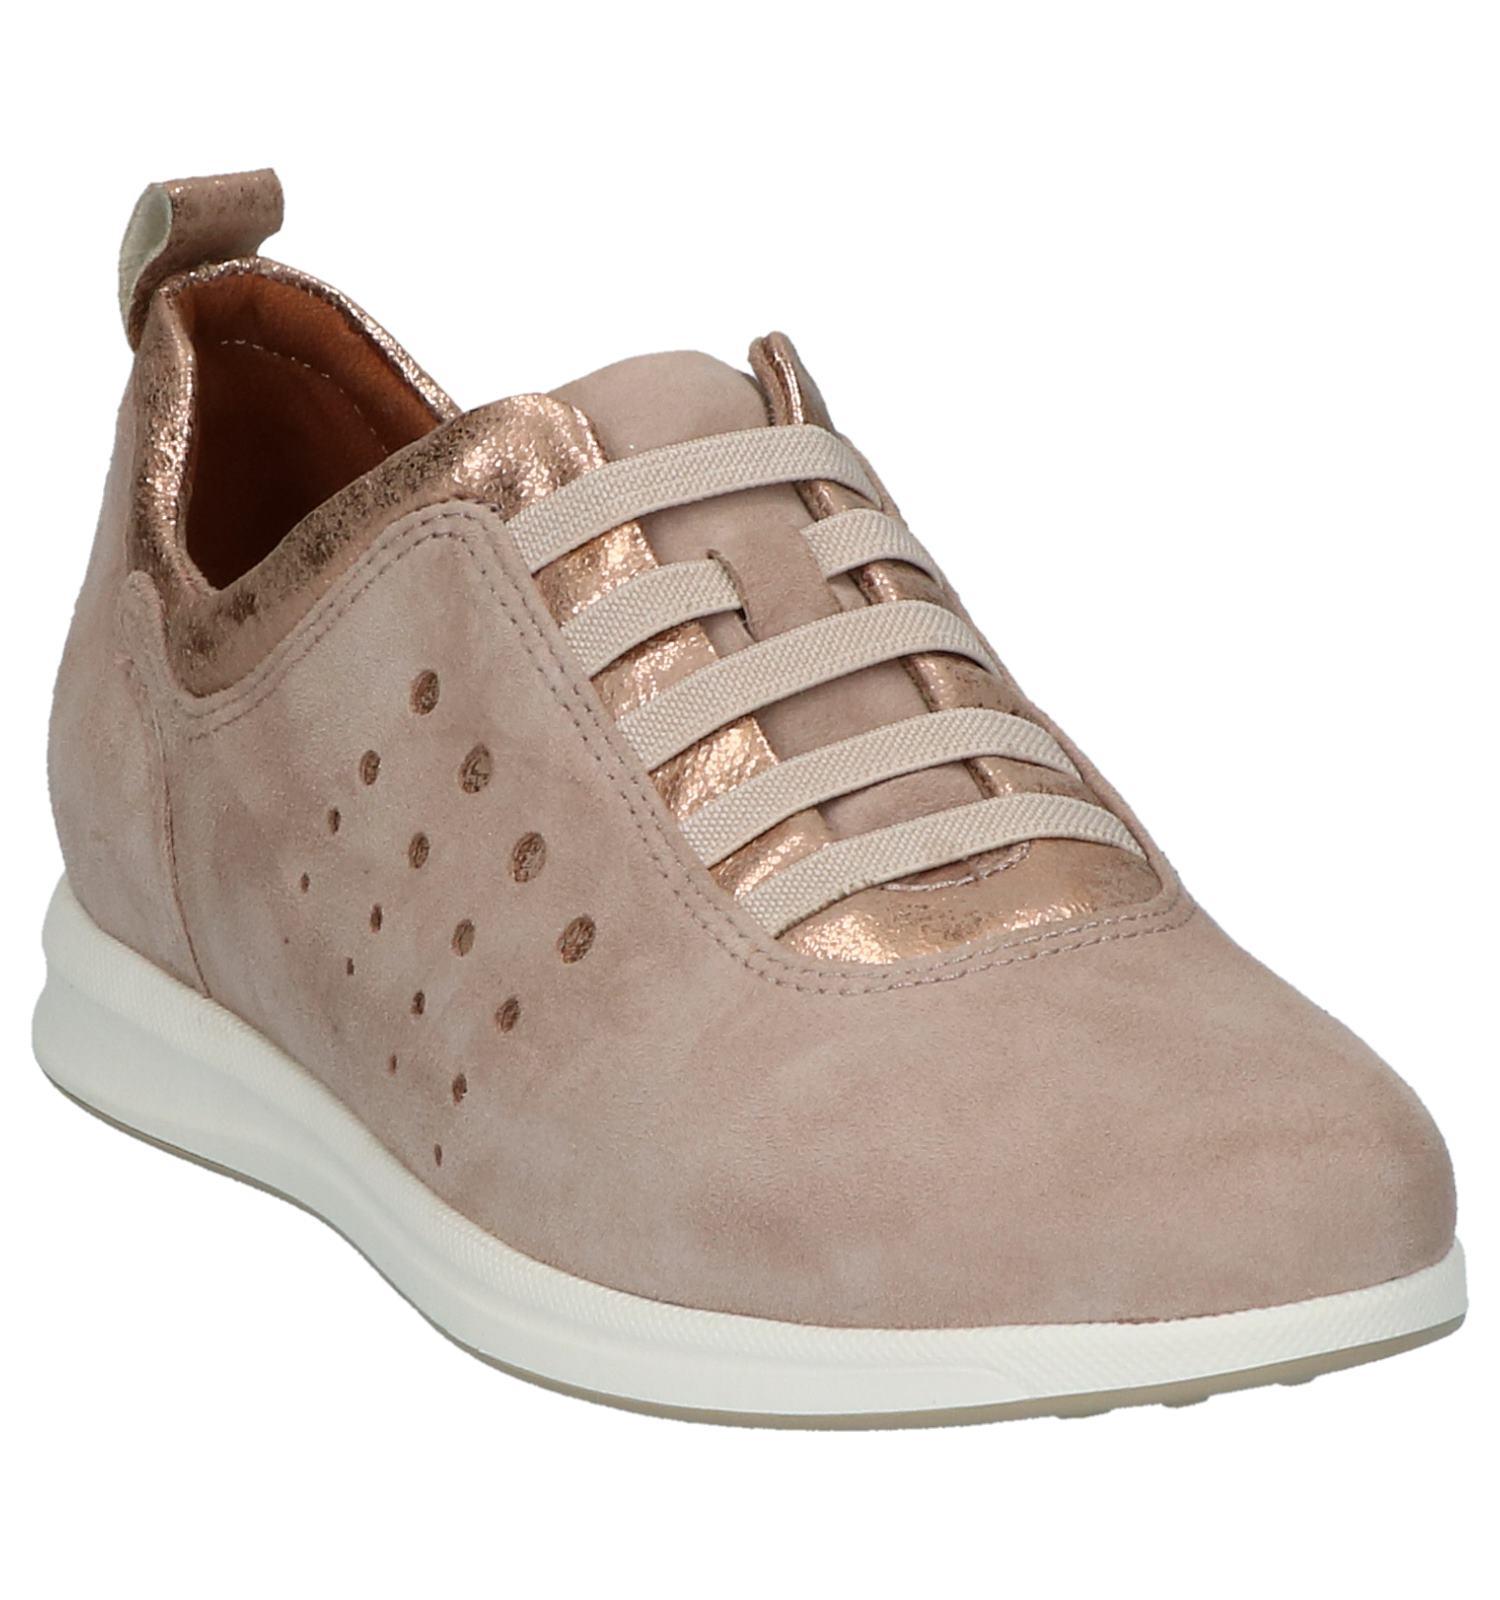 Sneakers Roze Slip on Donker Tamaris ordCBxe